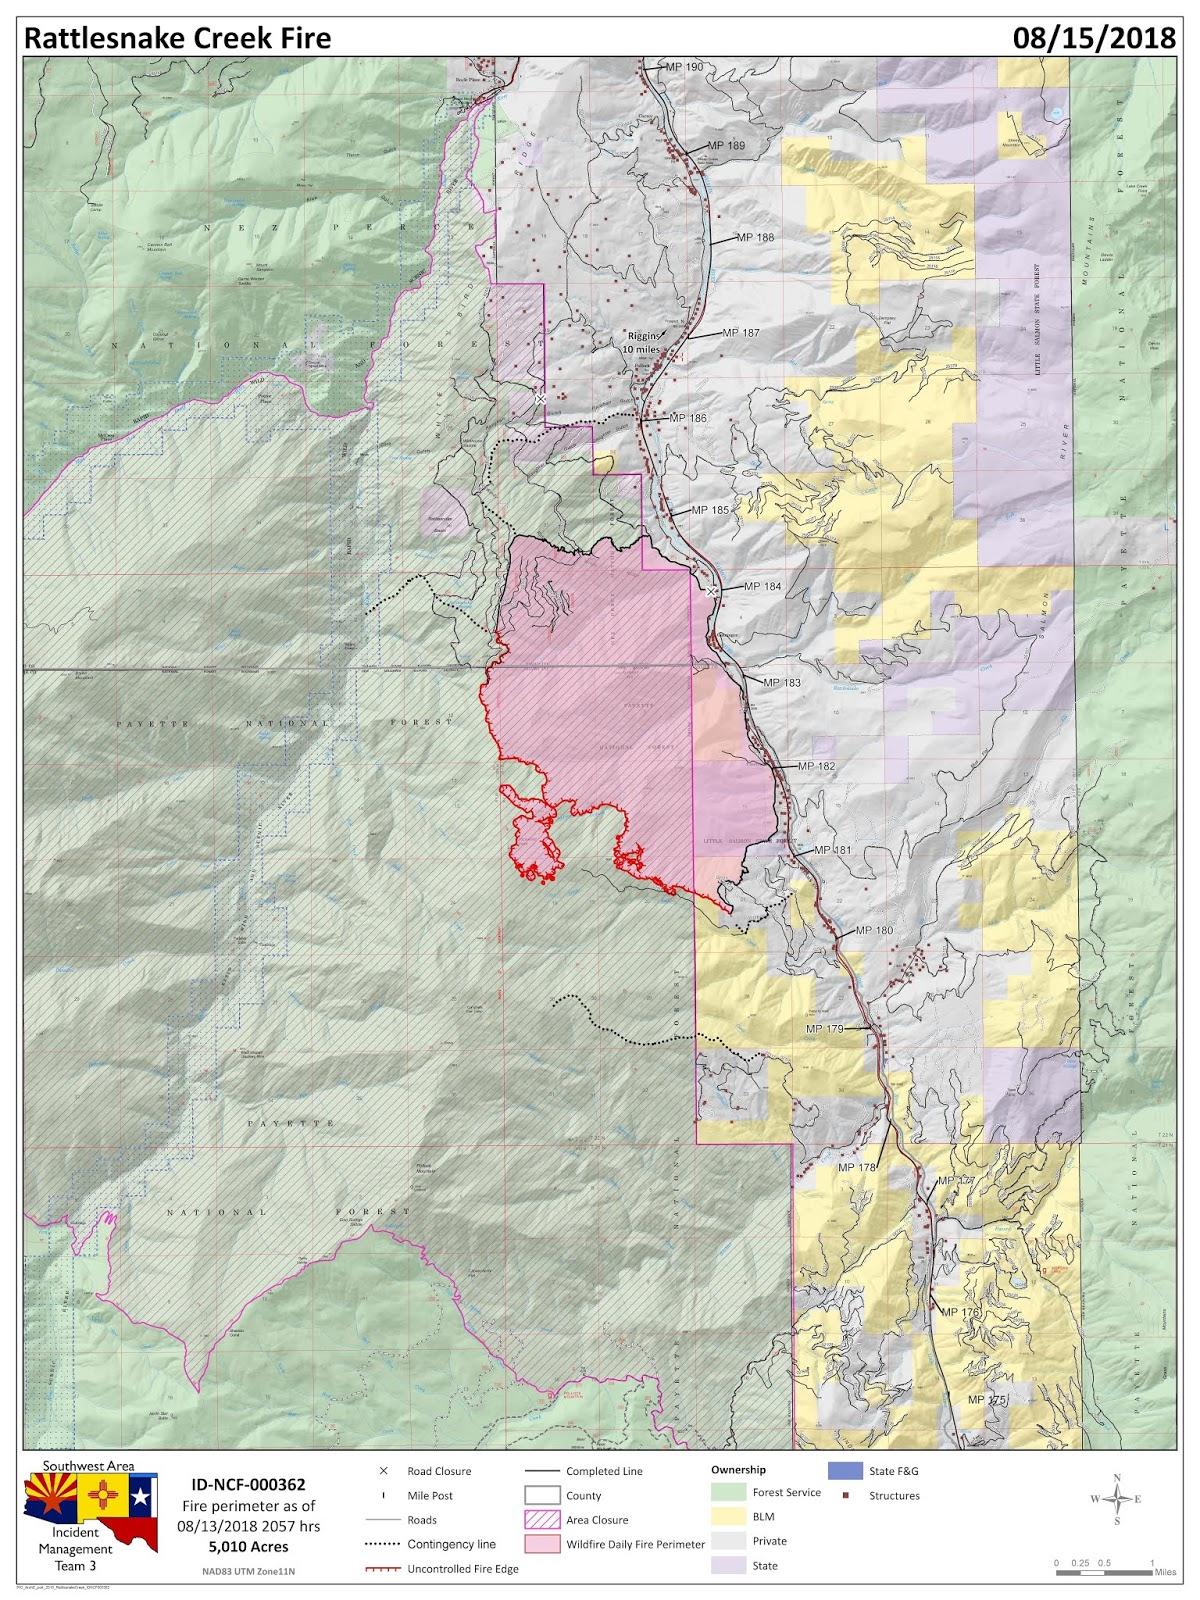 Idaho Fire Information Rattlesnake Fire Update August 15th